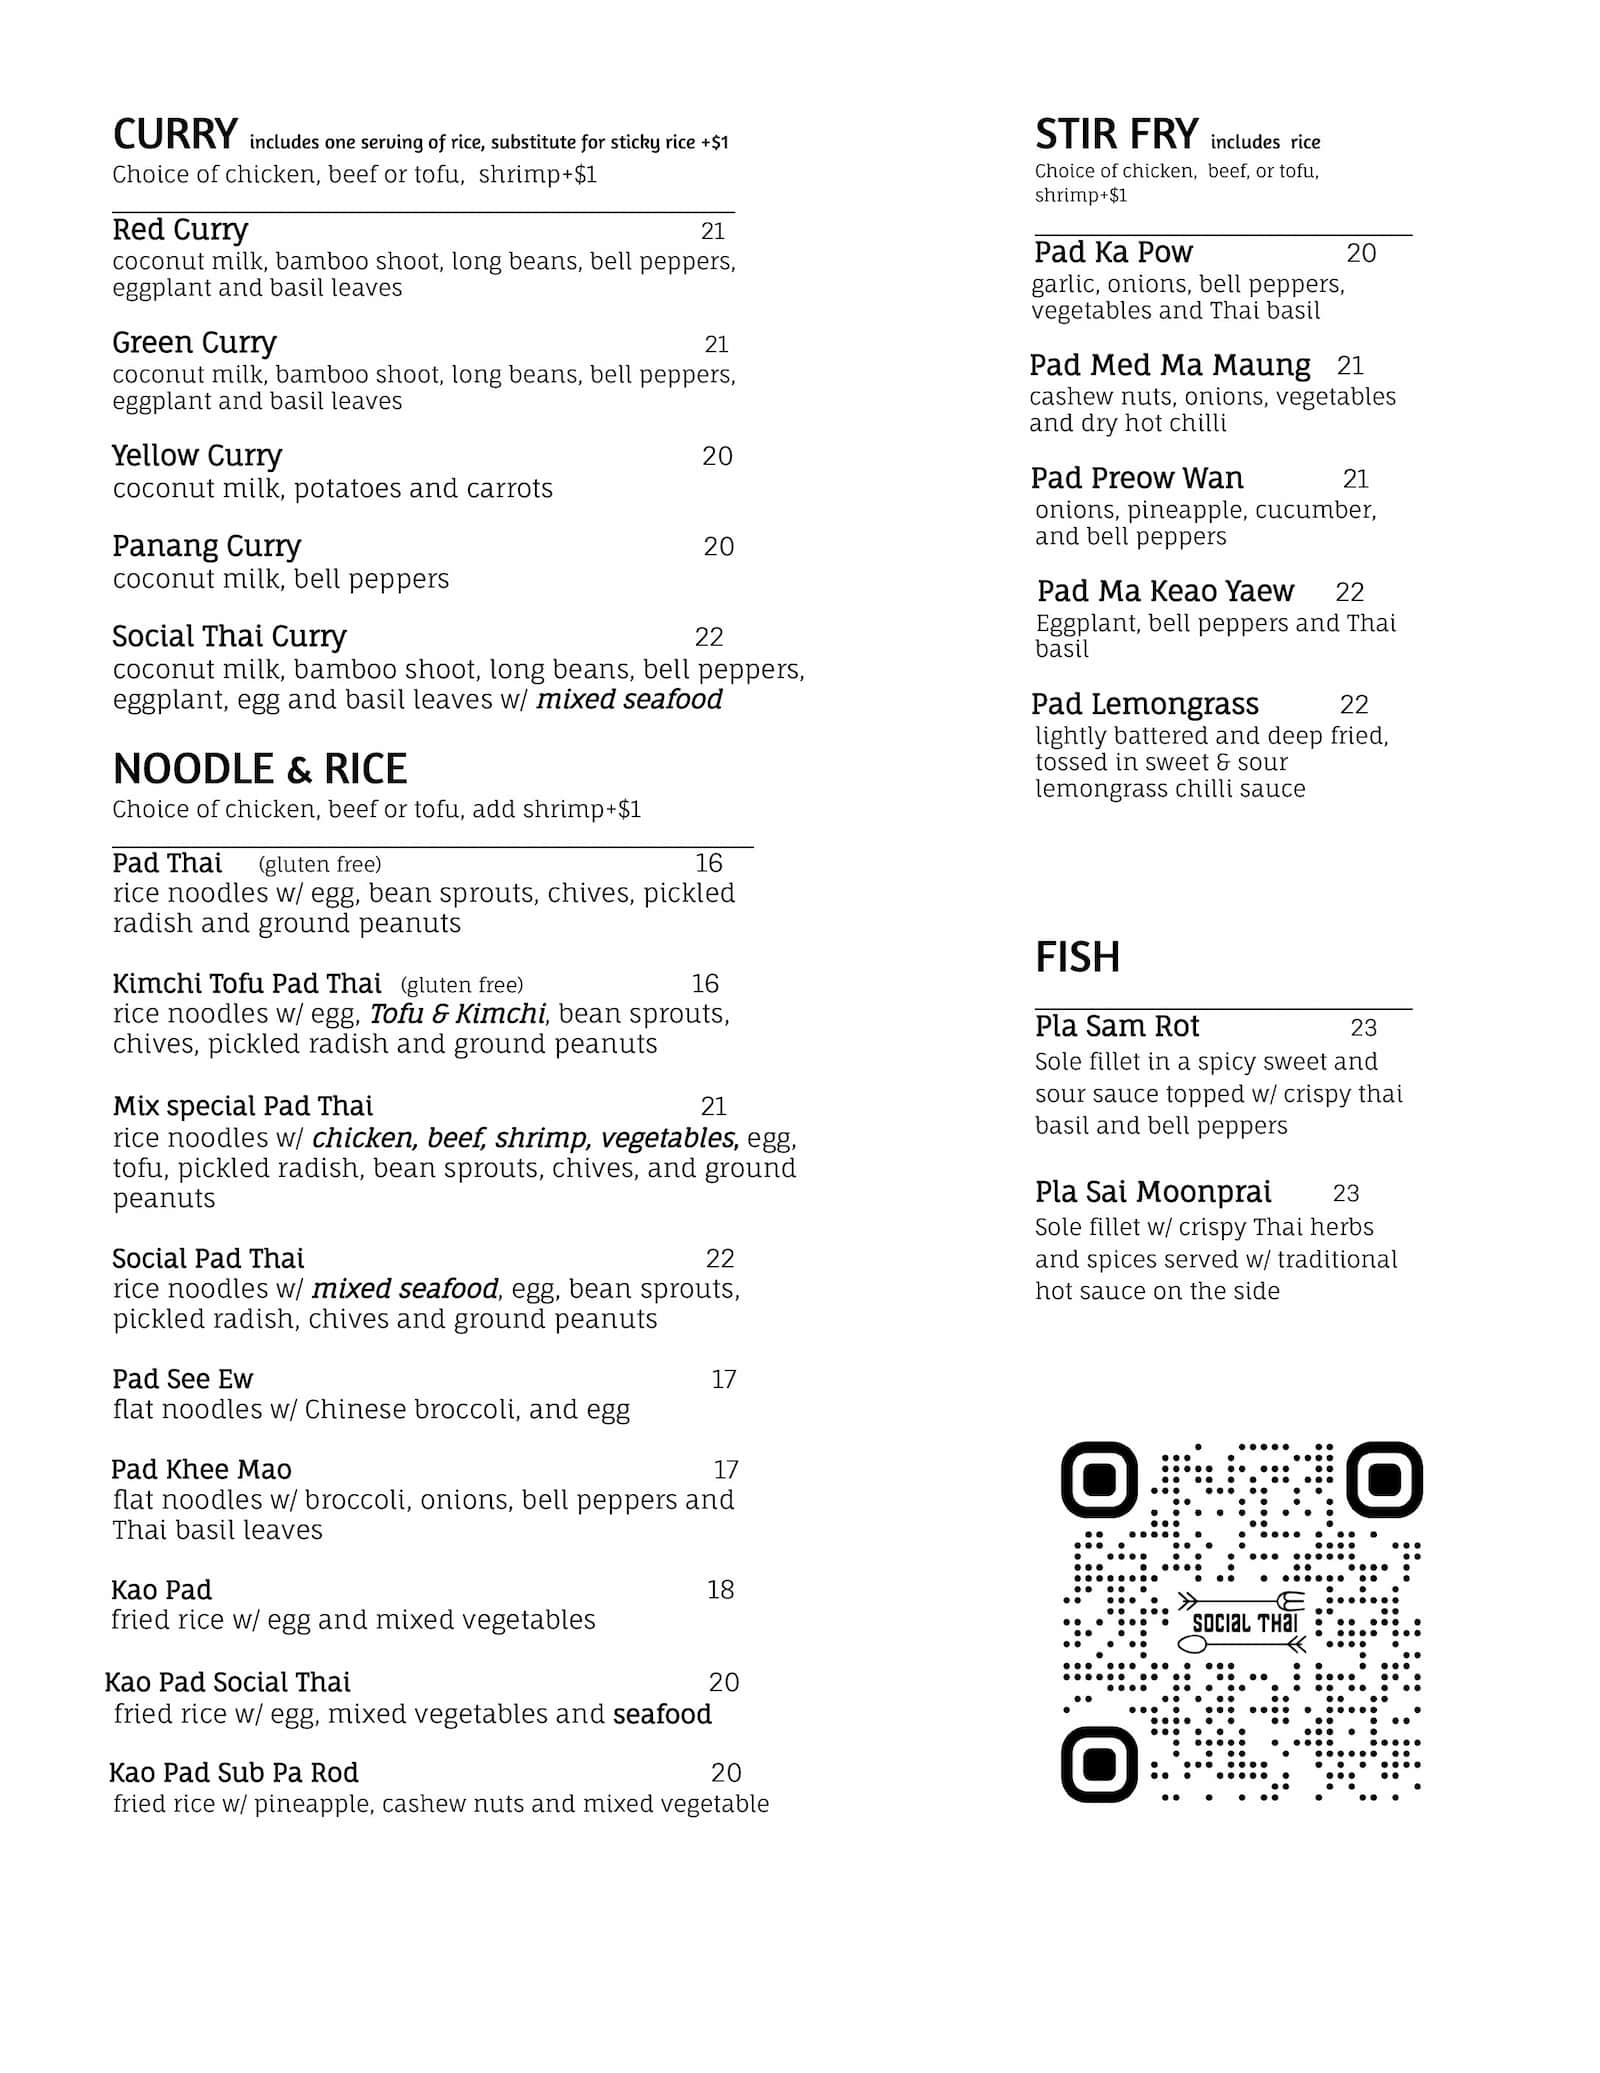 Social Thai Dinner Menu Page 2